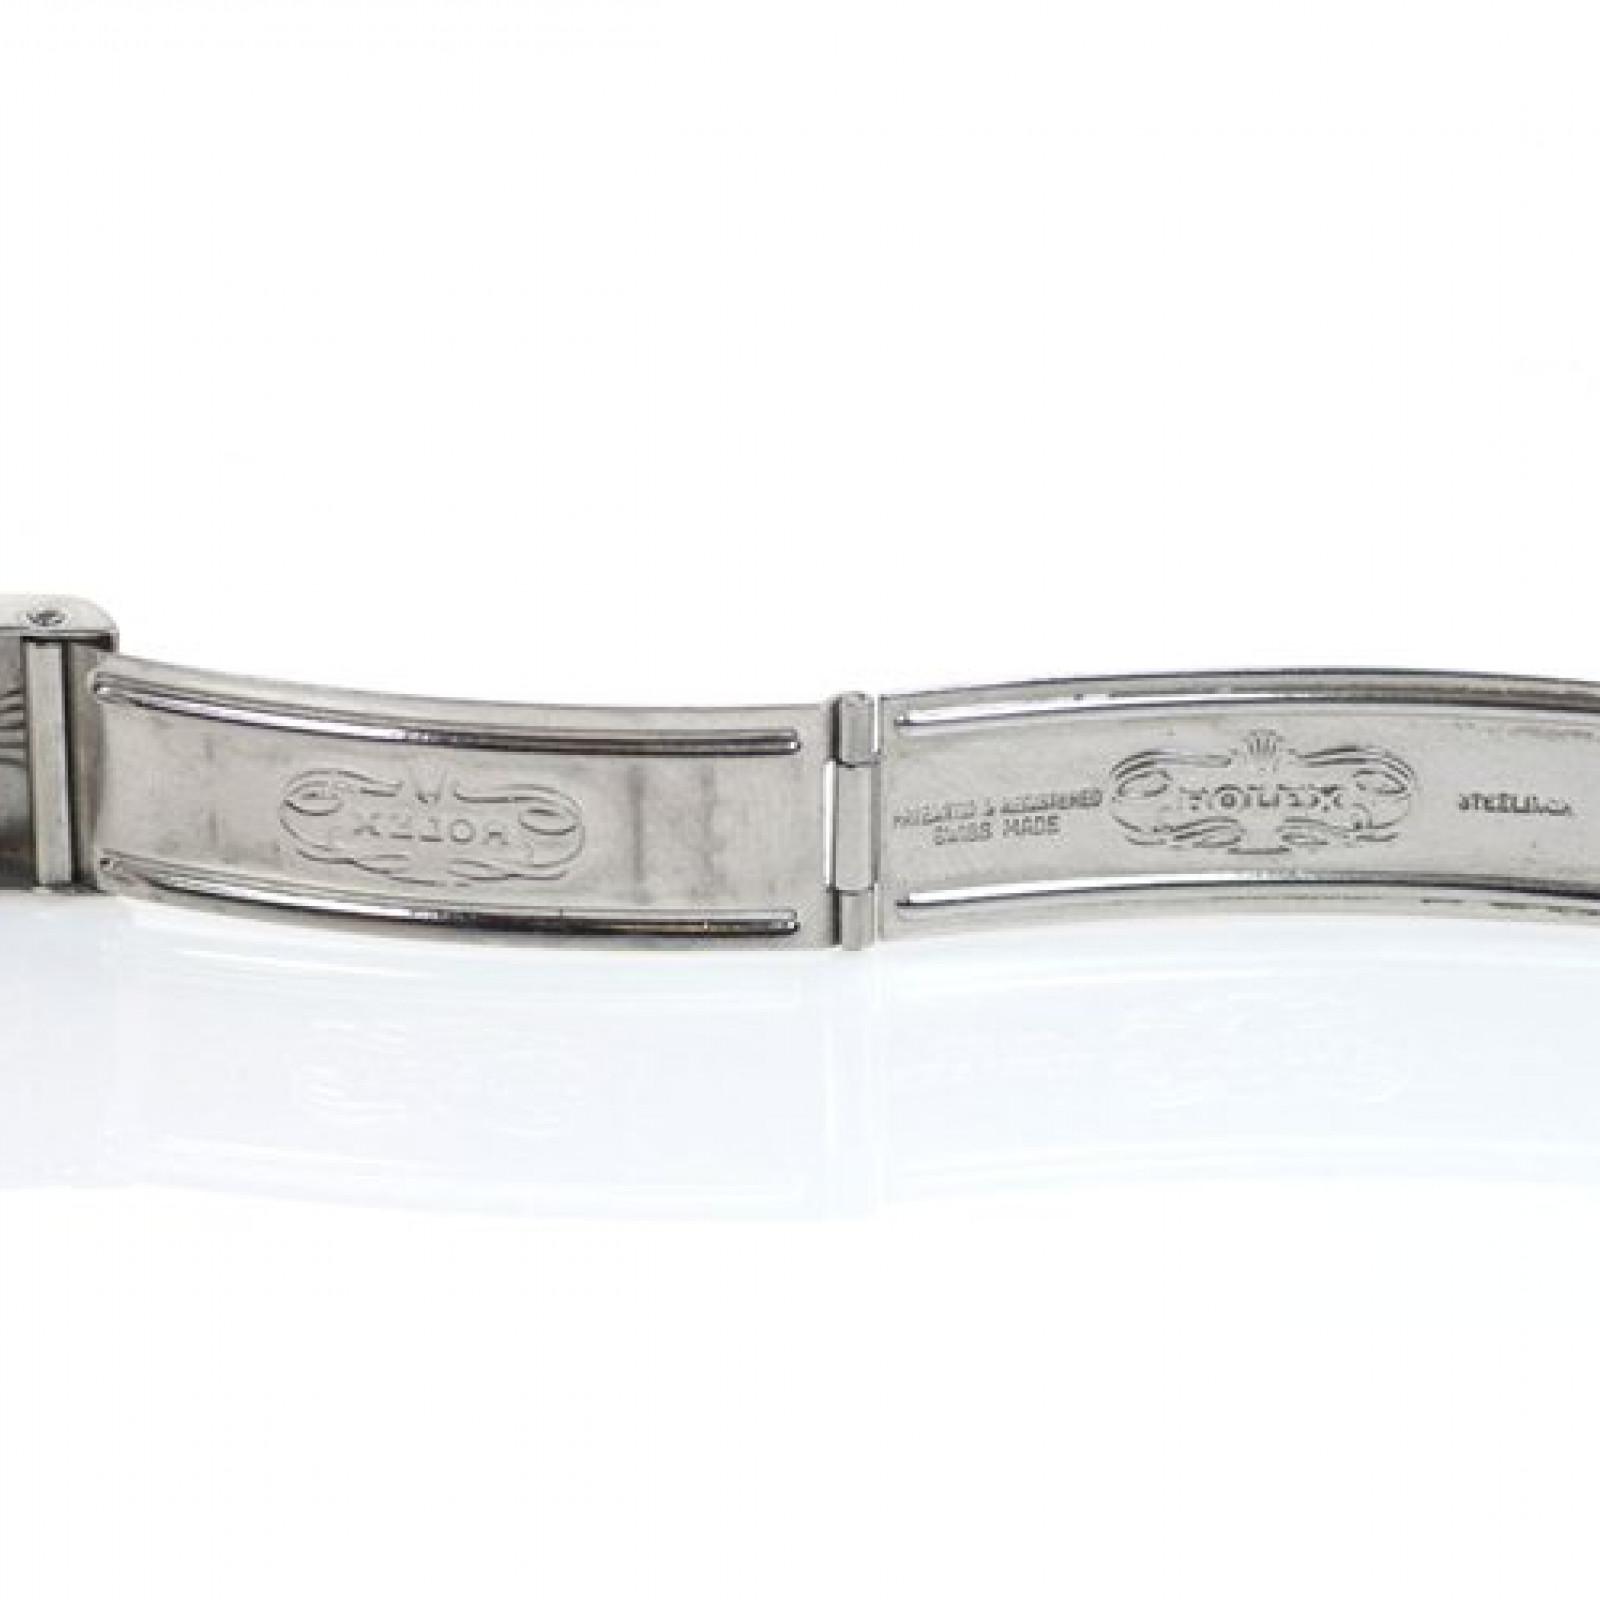 Vintage Rolex Daytona Cosmograph 6241